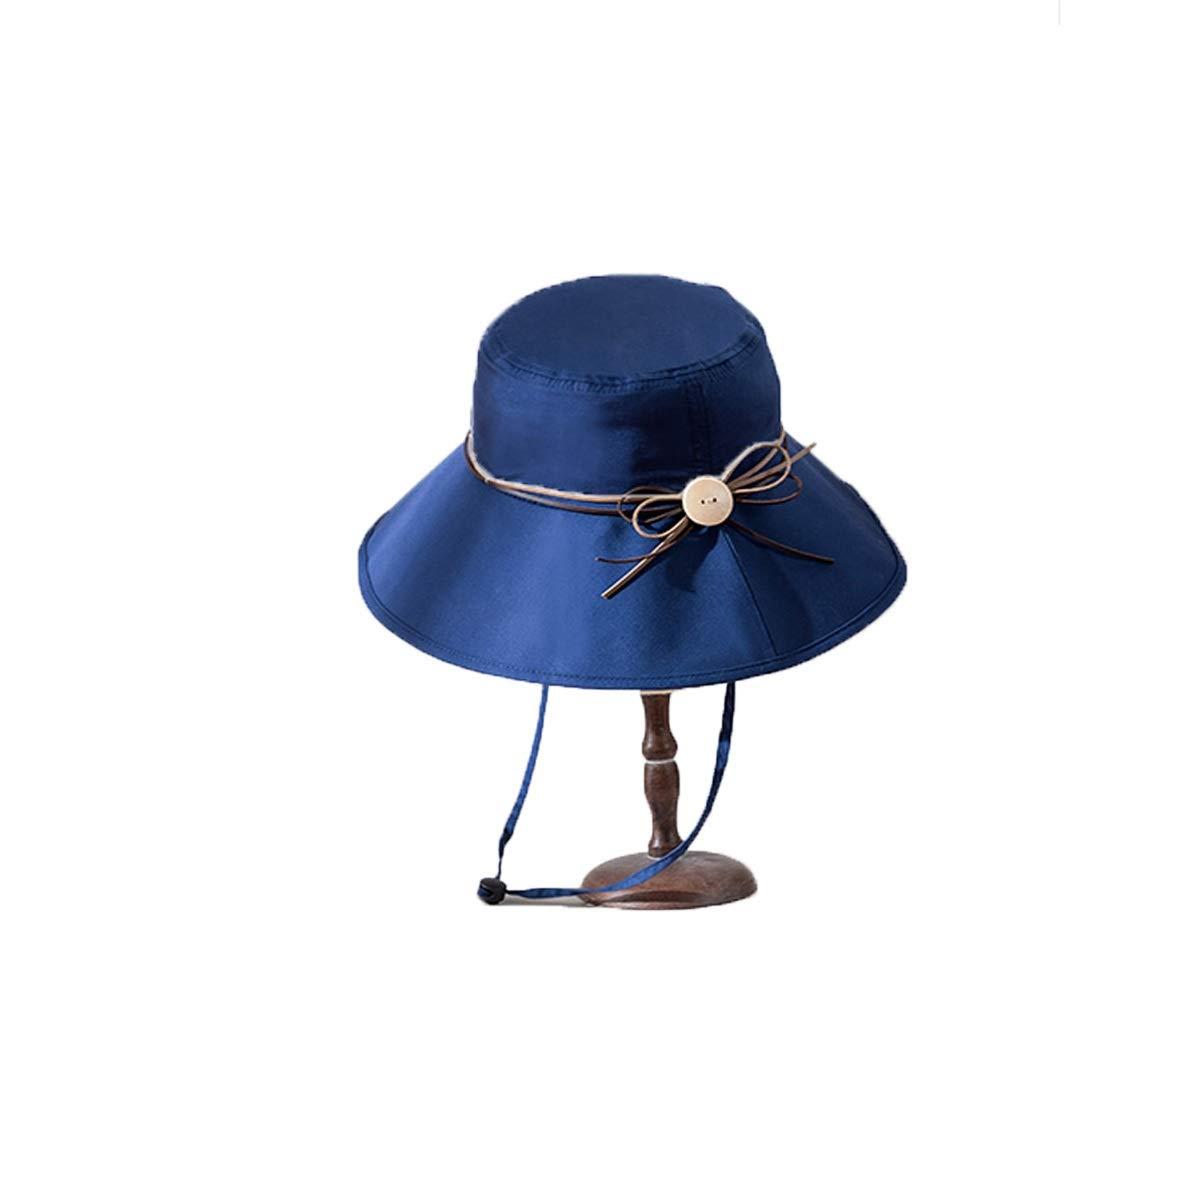 Zhongyue Women's Summer Visor Foldable UV Protection Big Hats Wild Series Sun Hat, Belge,Blue Summer hat (Color : Blue)